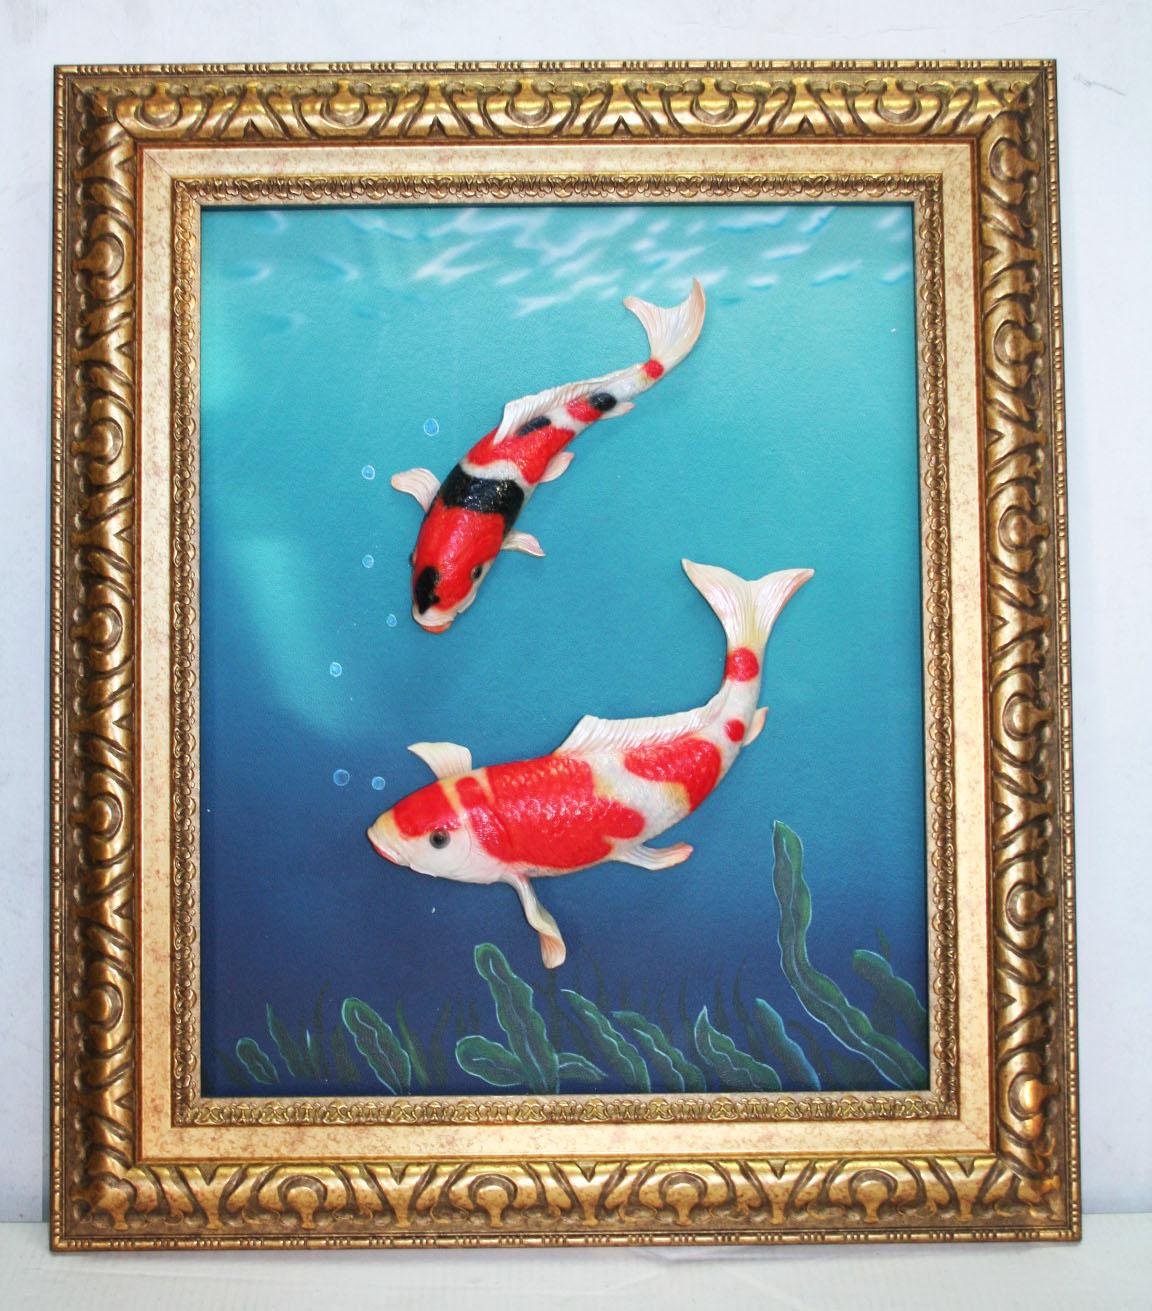 Japanese koi carp picture 3d koi gifts ornaments bjs for Japanese pond ornaments